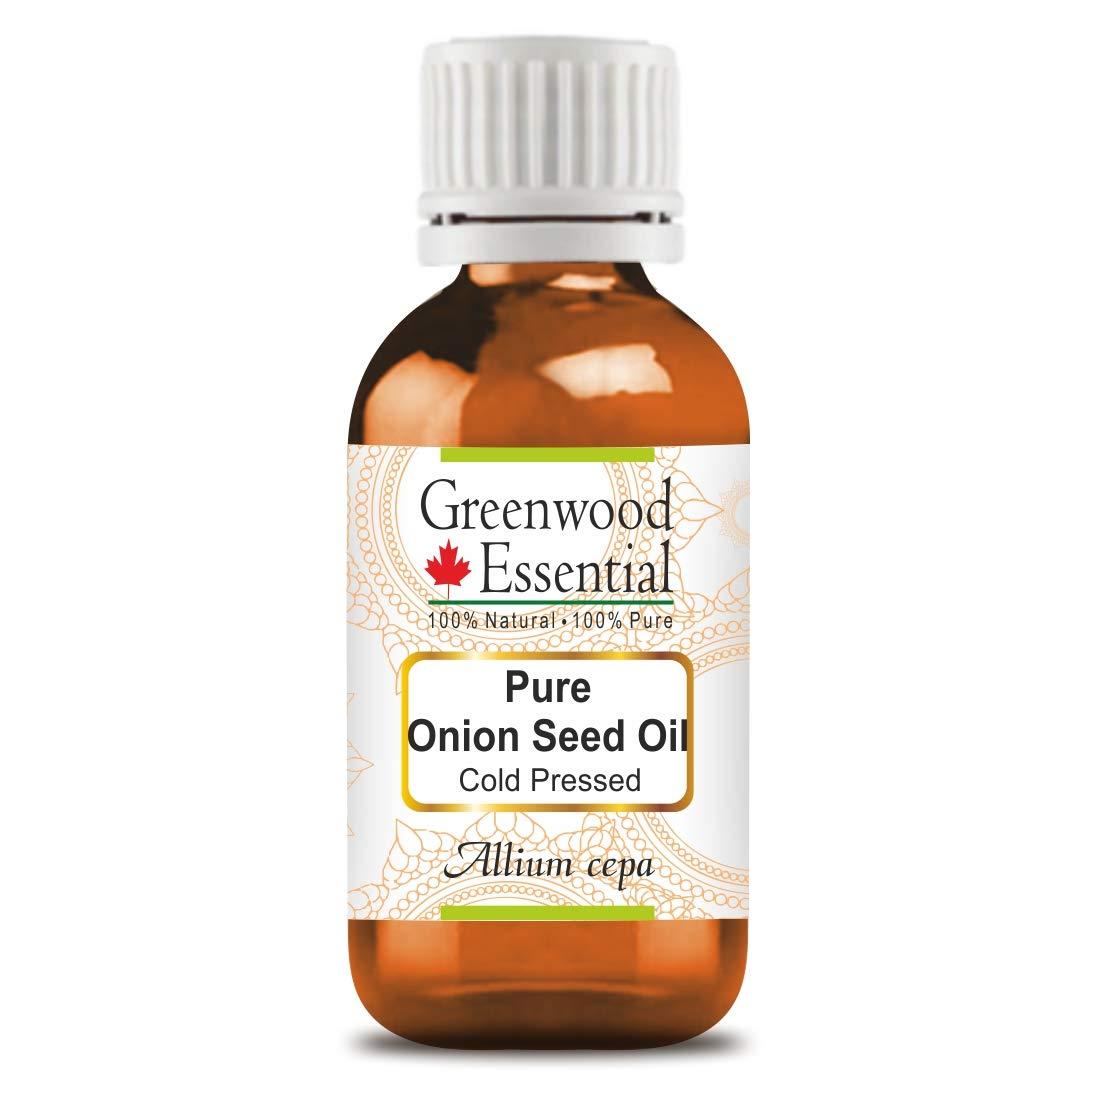 Greenwood Essential Pure Onion Seed Oil (Allium cepa) 100% Natur